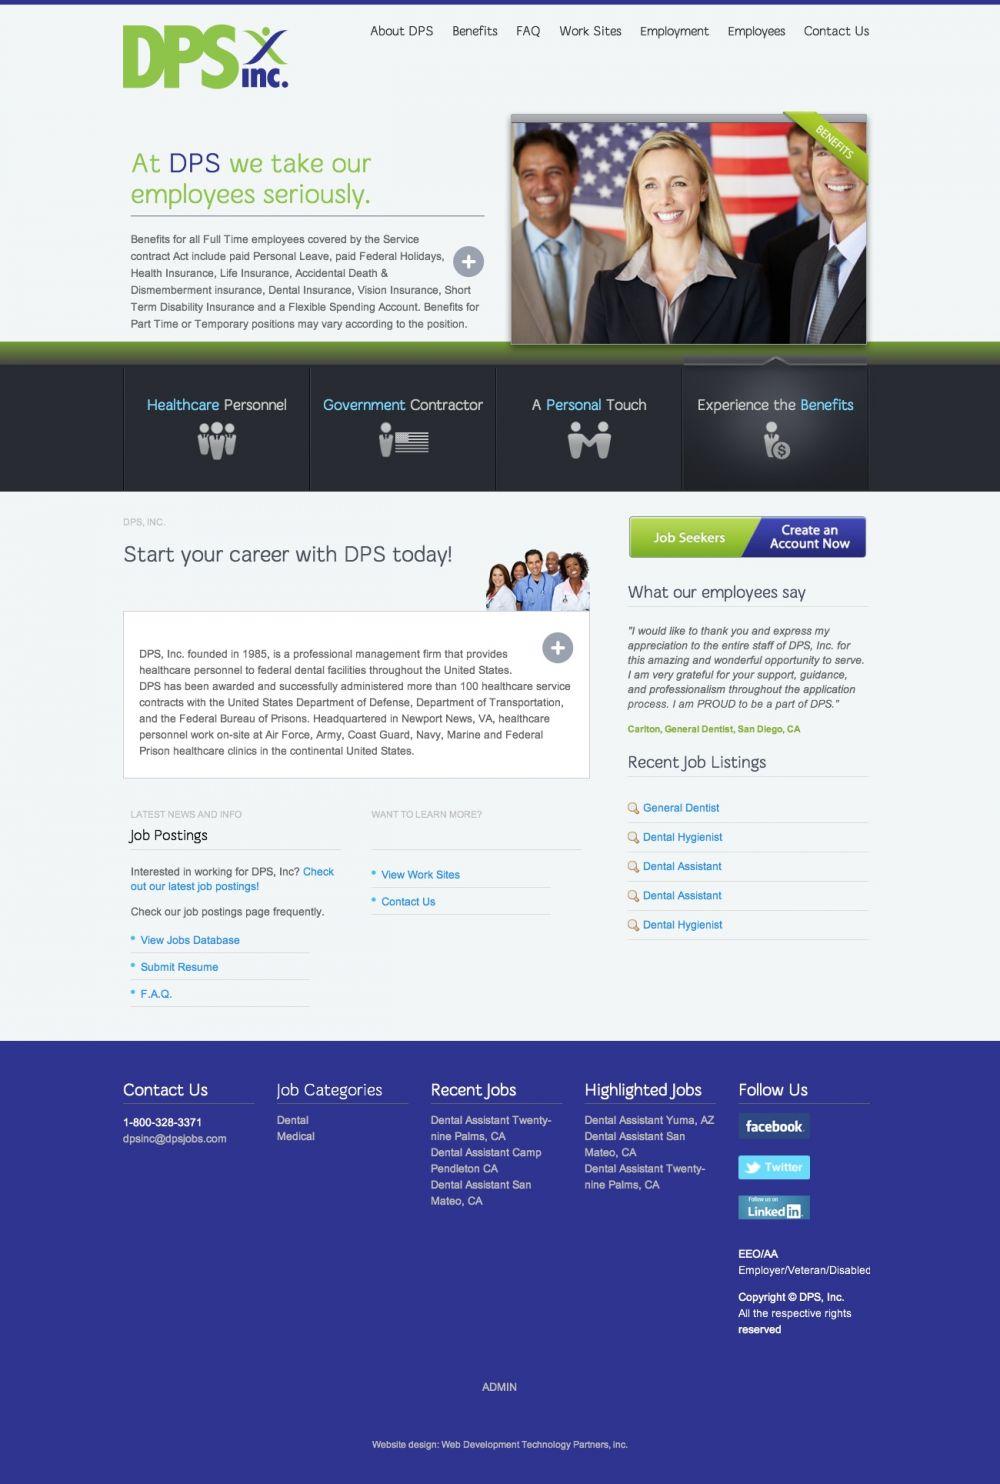 DPS Jobs 2015 Redesign